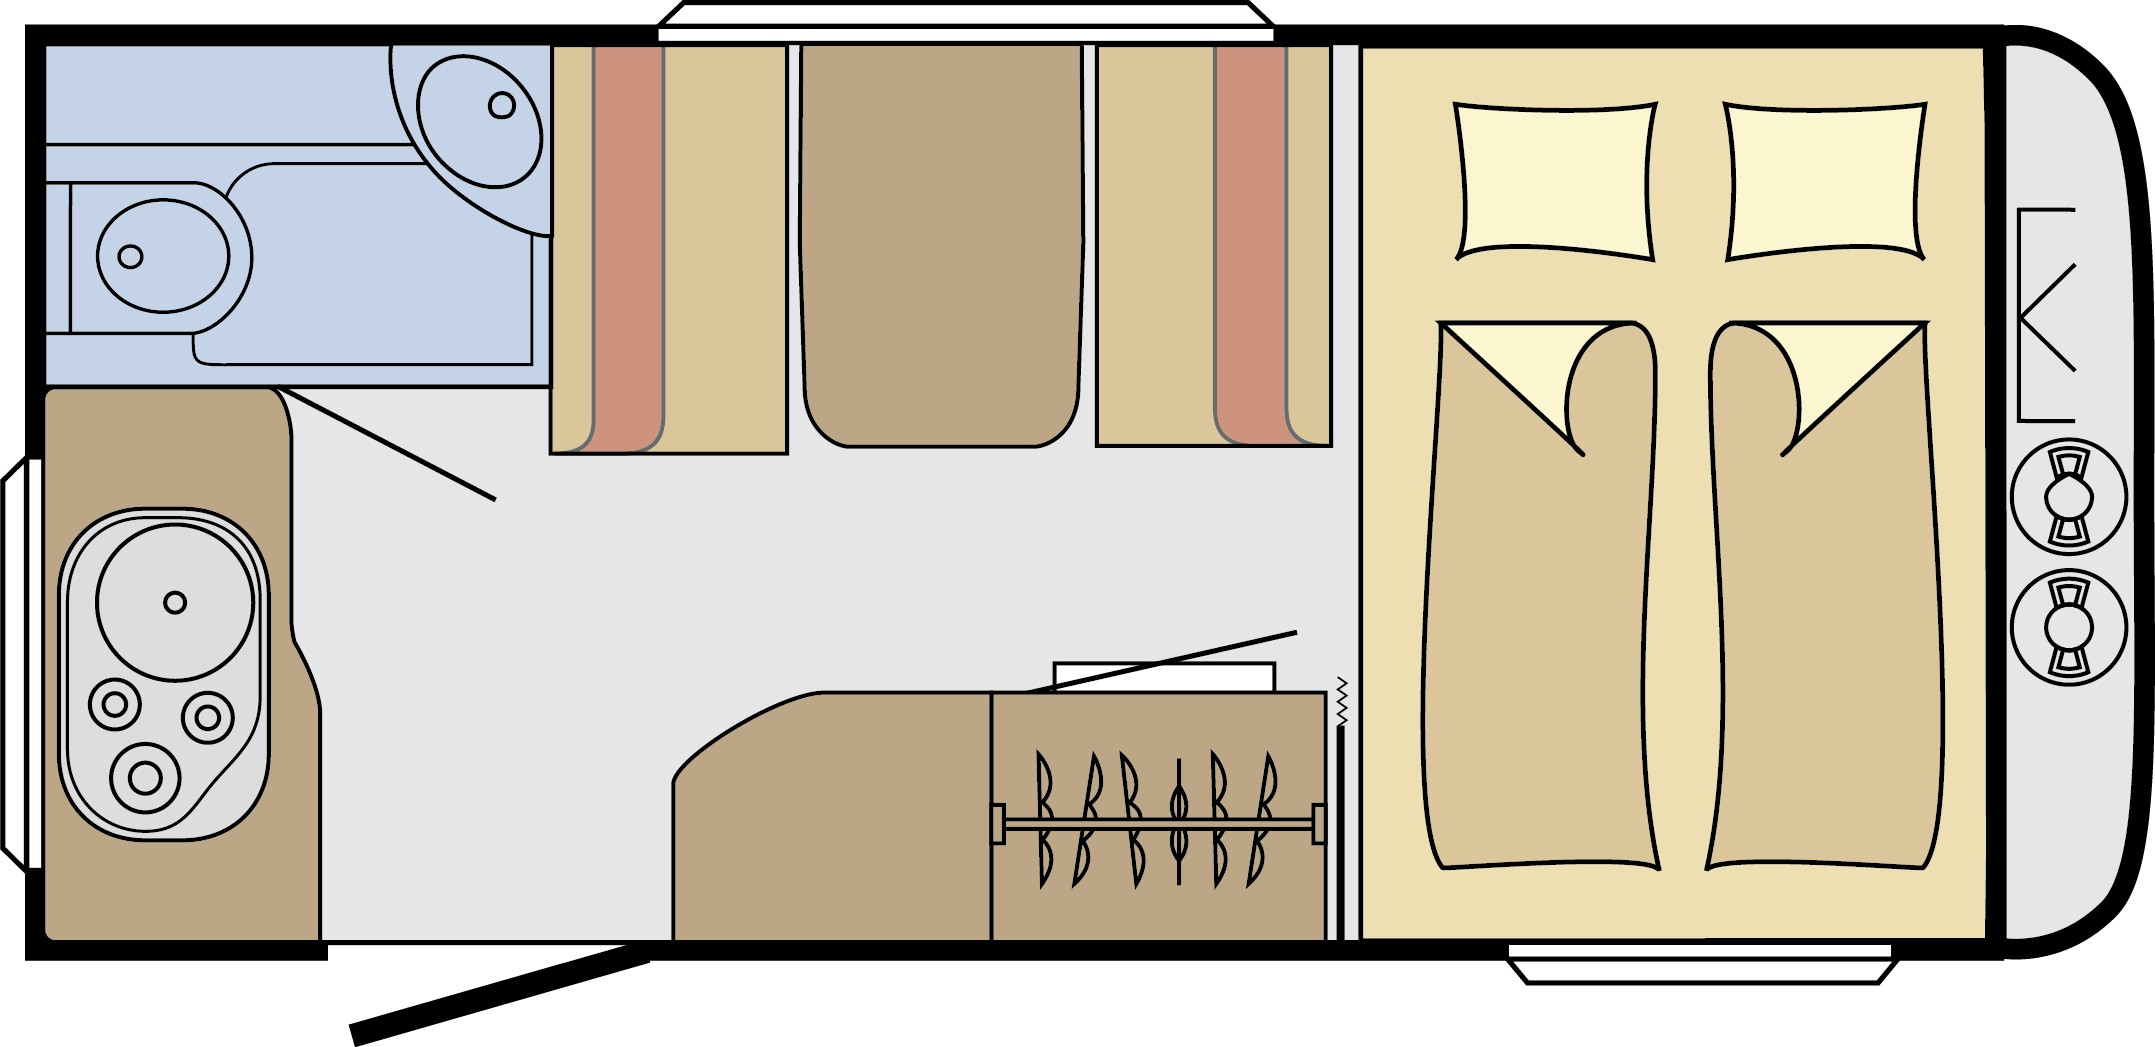 sunlight c 42 d grundriss i love camping i love camping. Black Bedroom Furniture Sets. Home Design Ideas